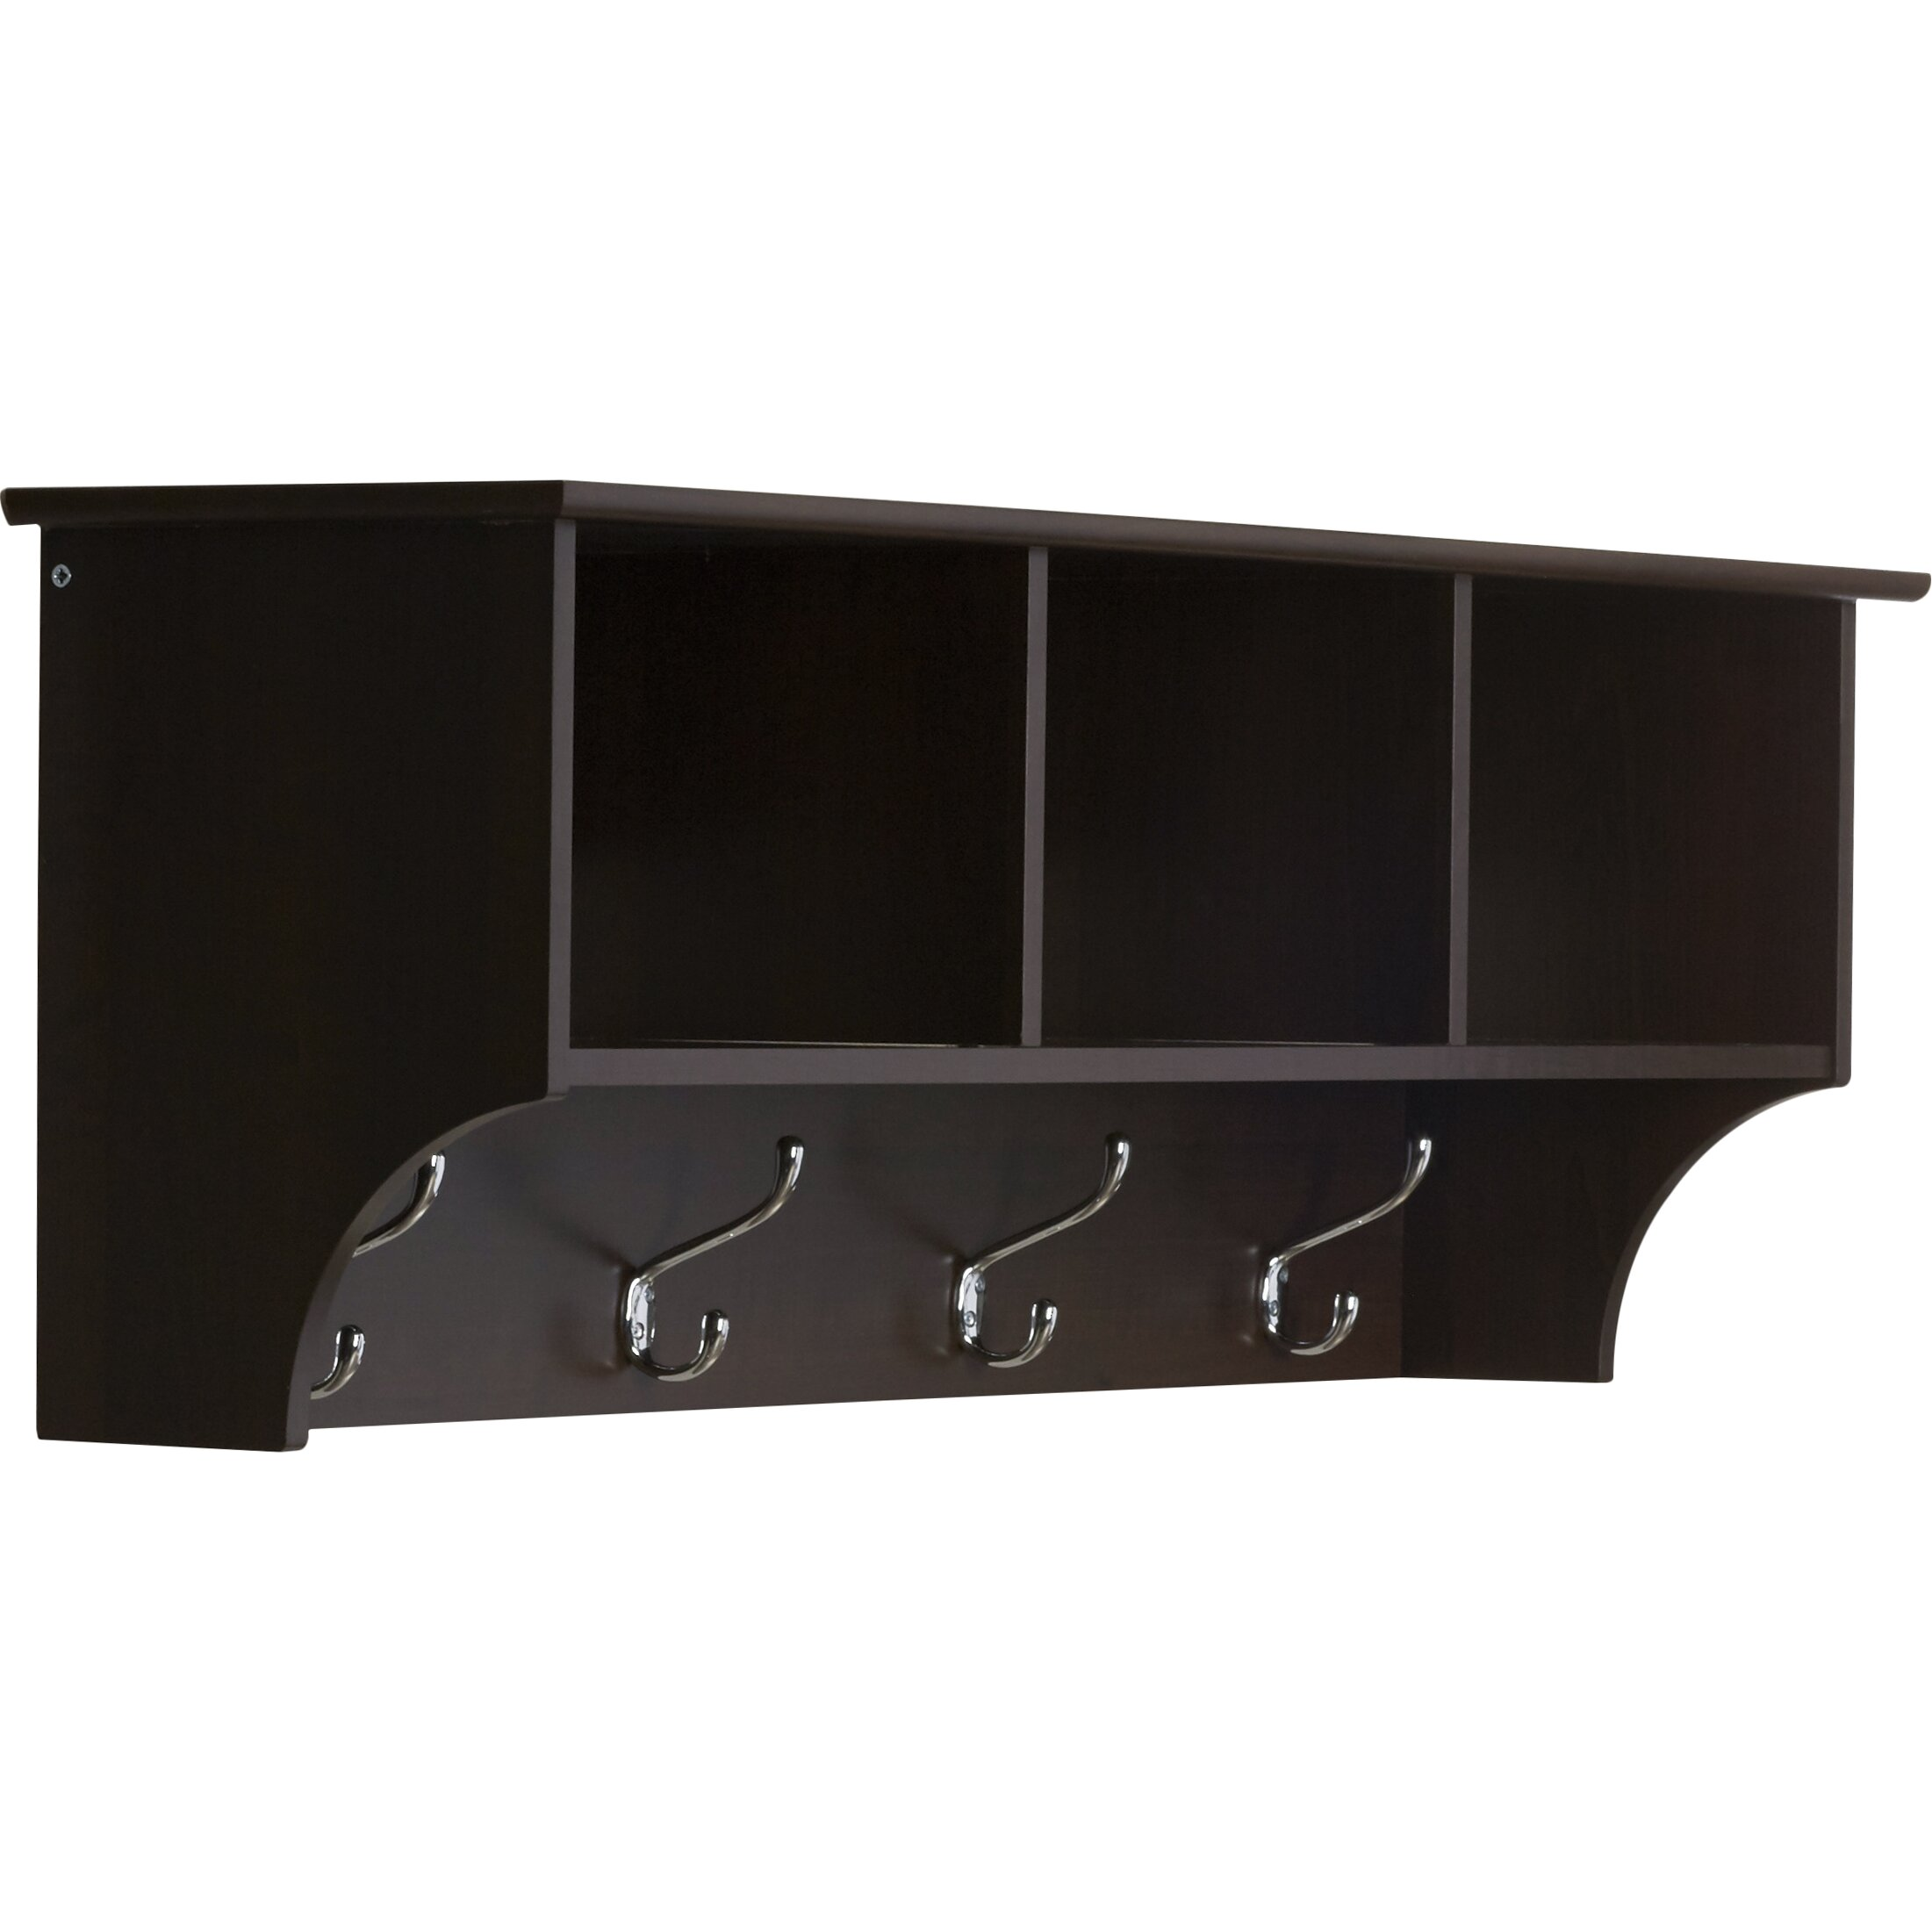 andover mills wall mounted coat rack reviews wayfair. Black Bedroom Furniture Sets. Home Design Ideas